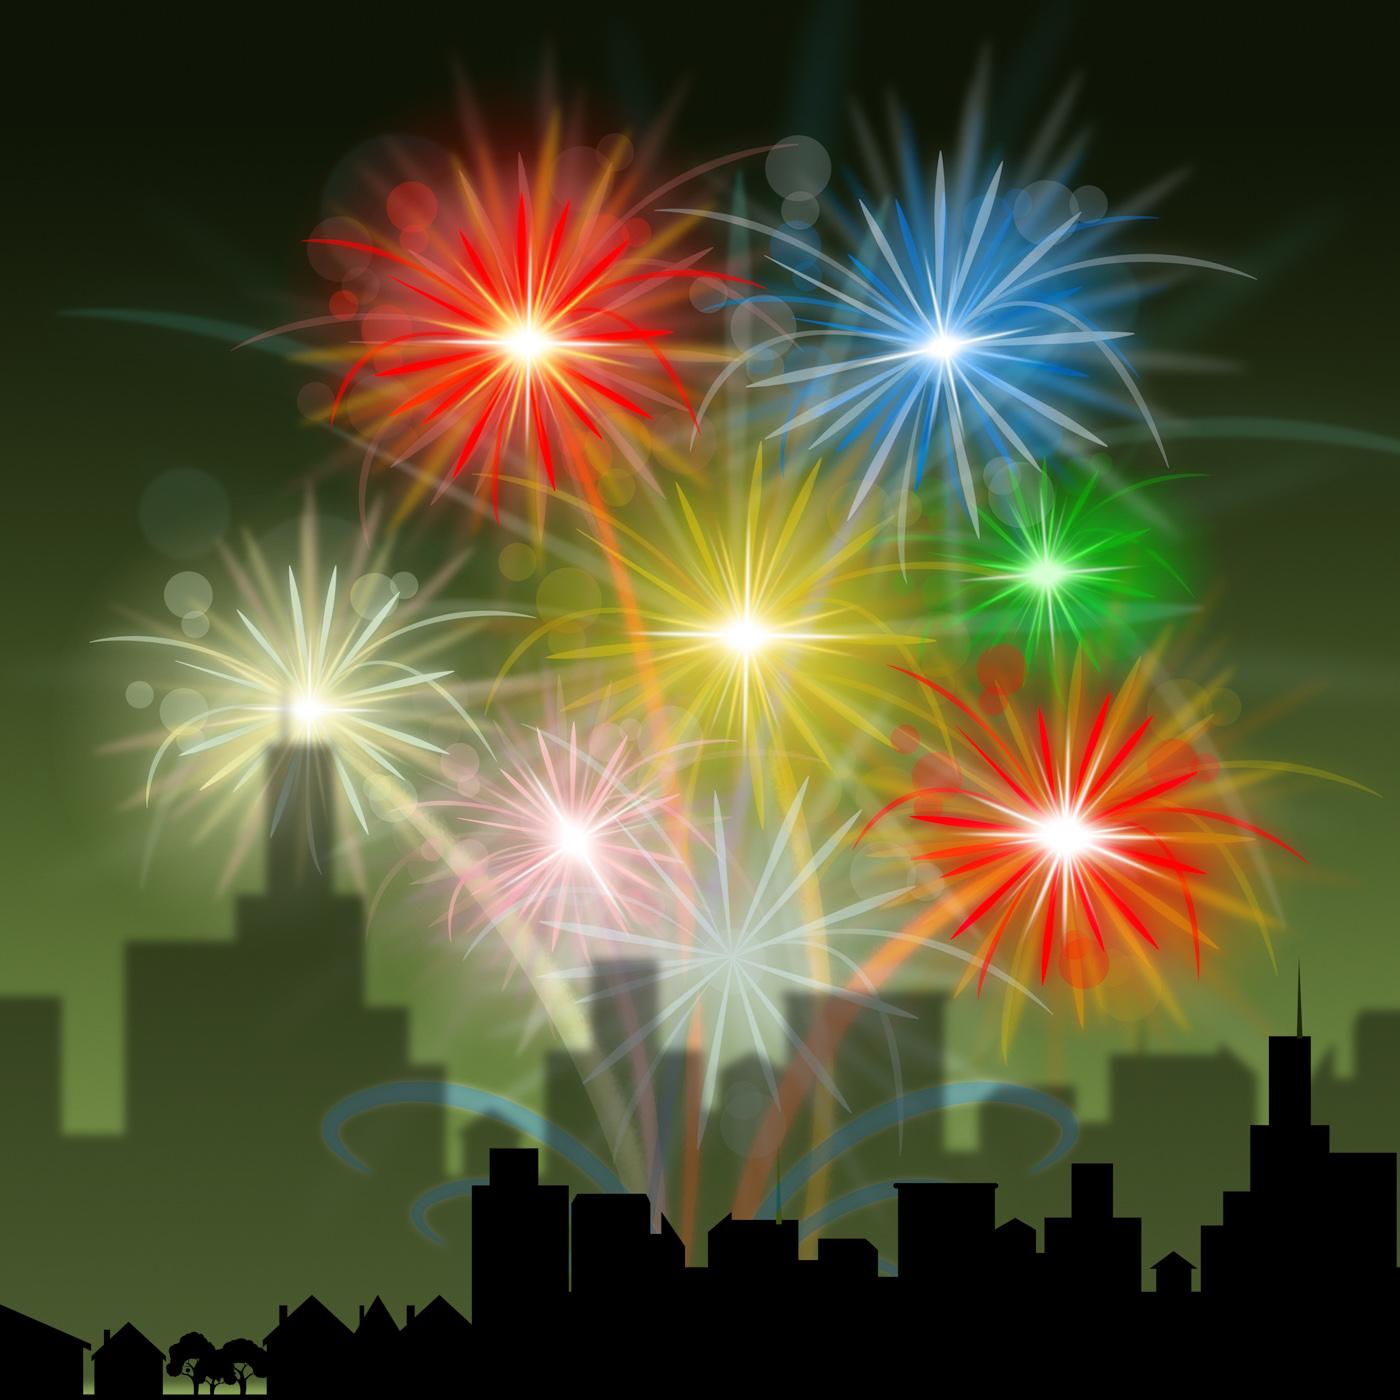 Fireworks City Indicates Night Sky And Celebration, Buildings, Festive, Pyrotechnics, Pyrotechnic, HQ Photo